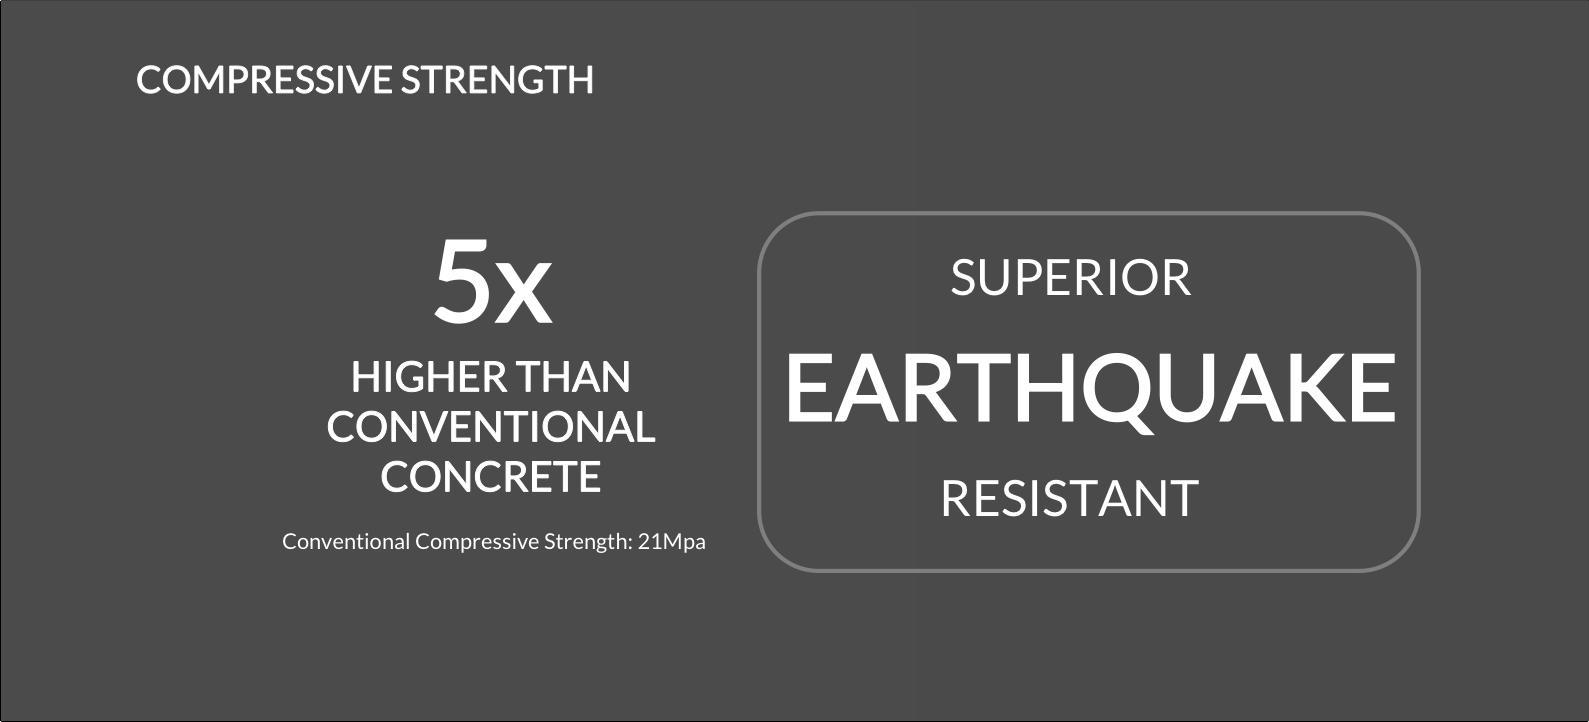 Compressive Strength